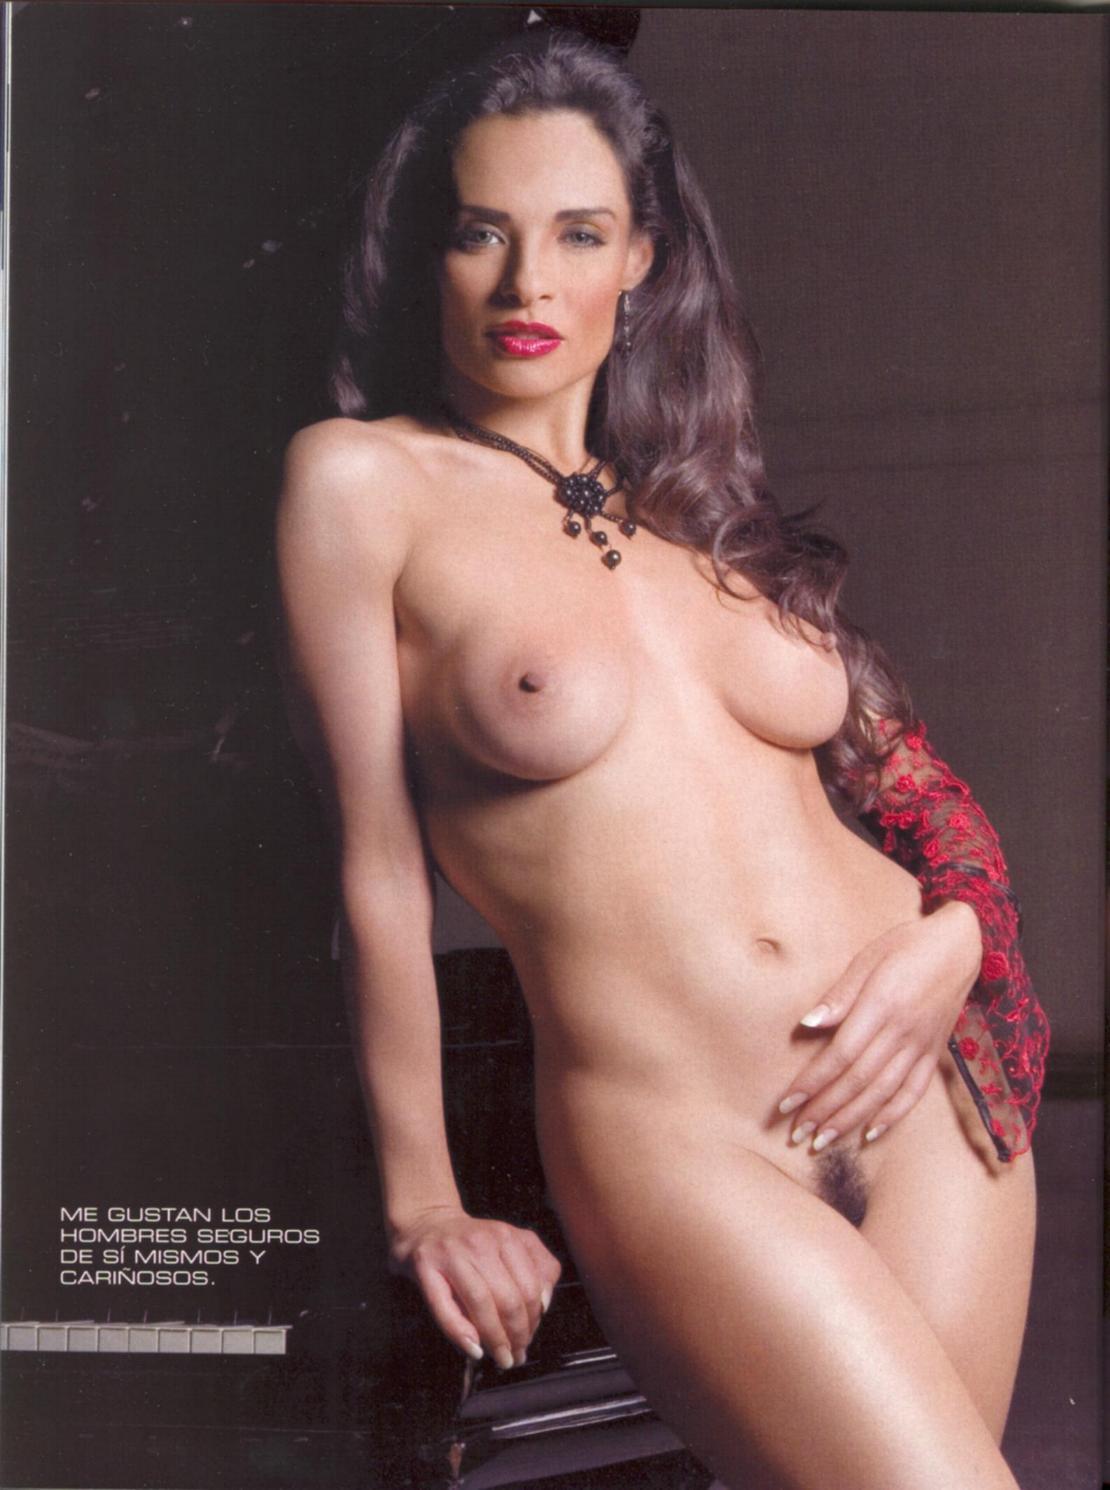 Alma Cero Desnuda Sin Censura alma cero rosaurora totalmente desnuda penthouse - descarga